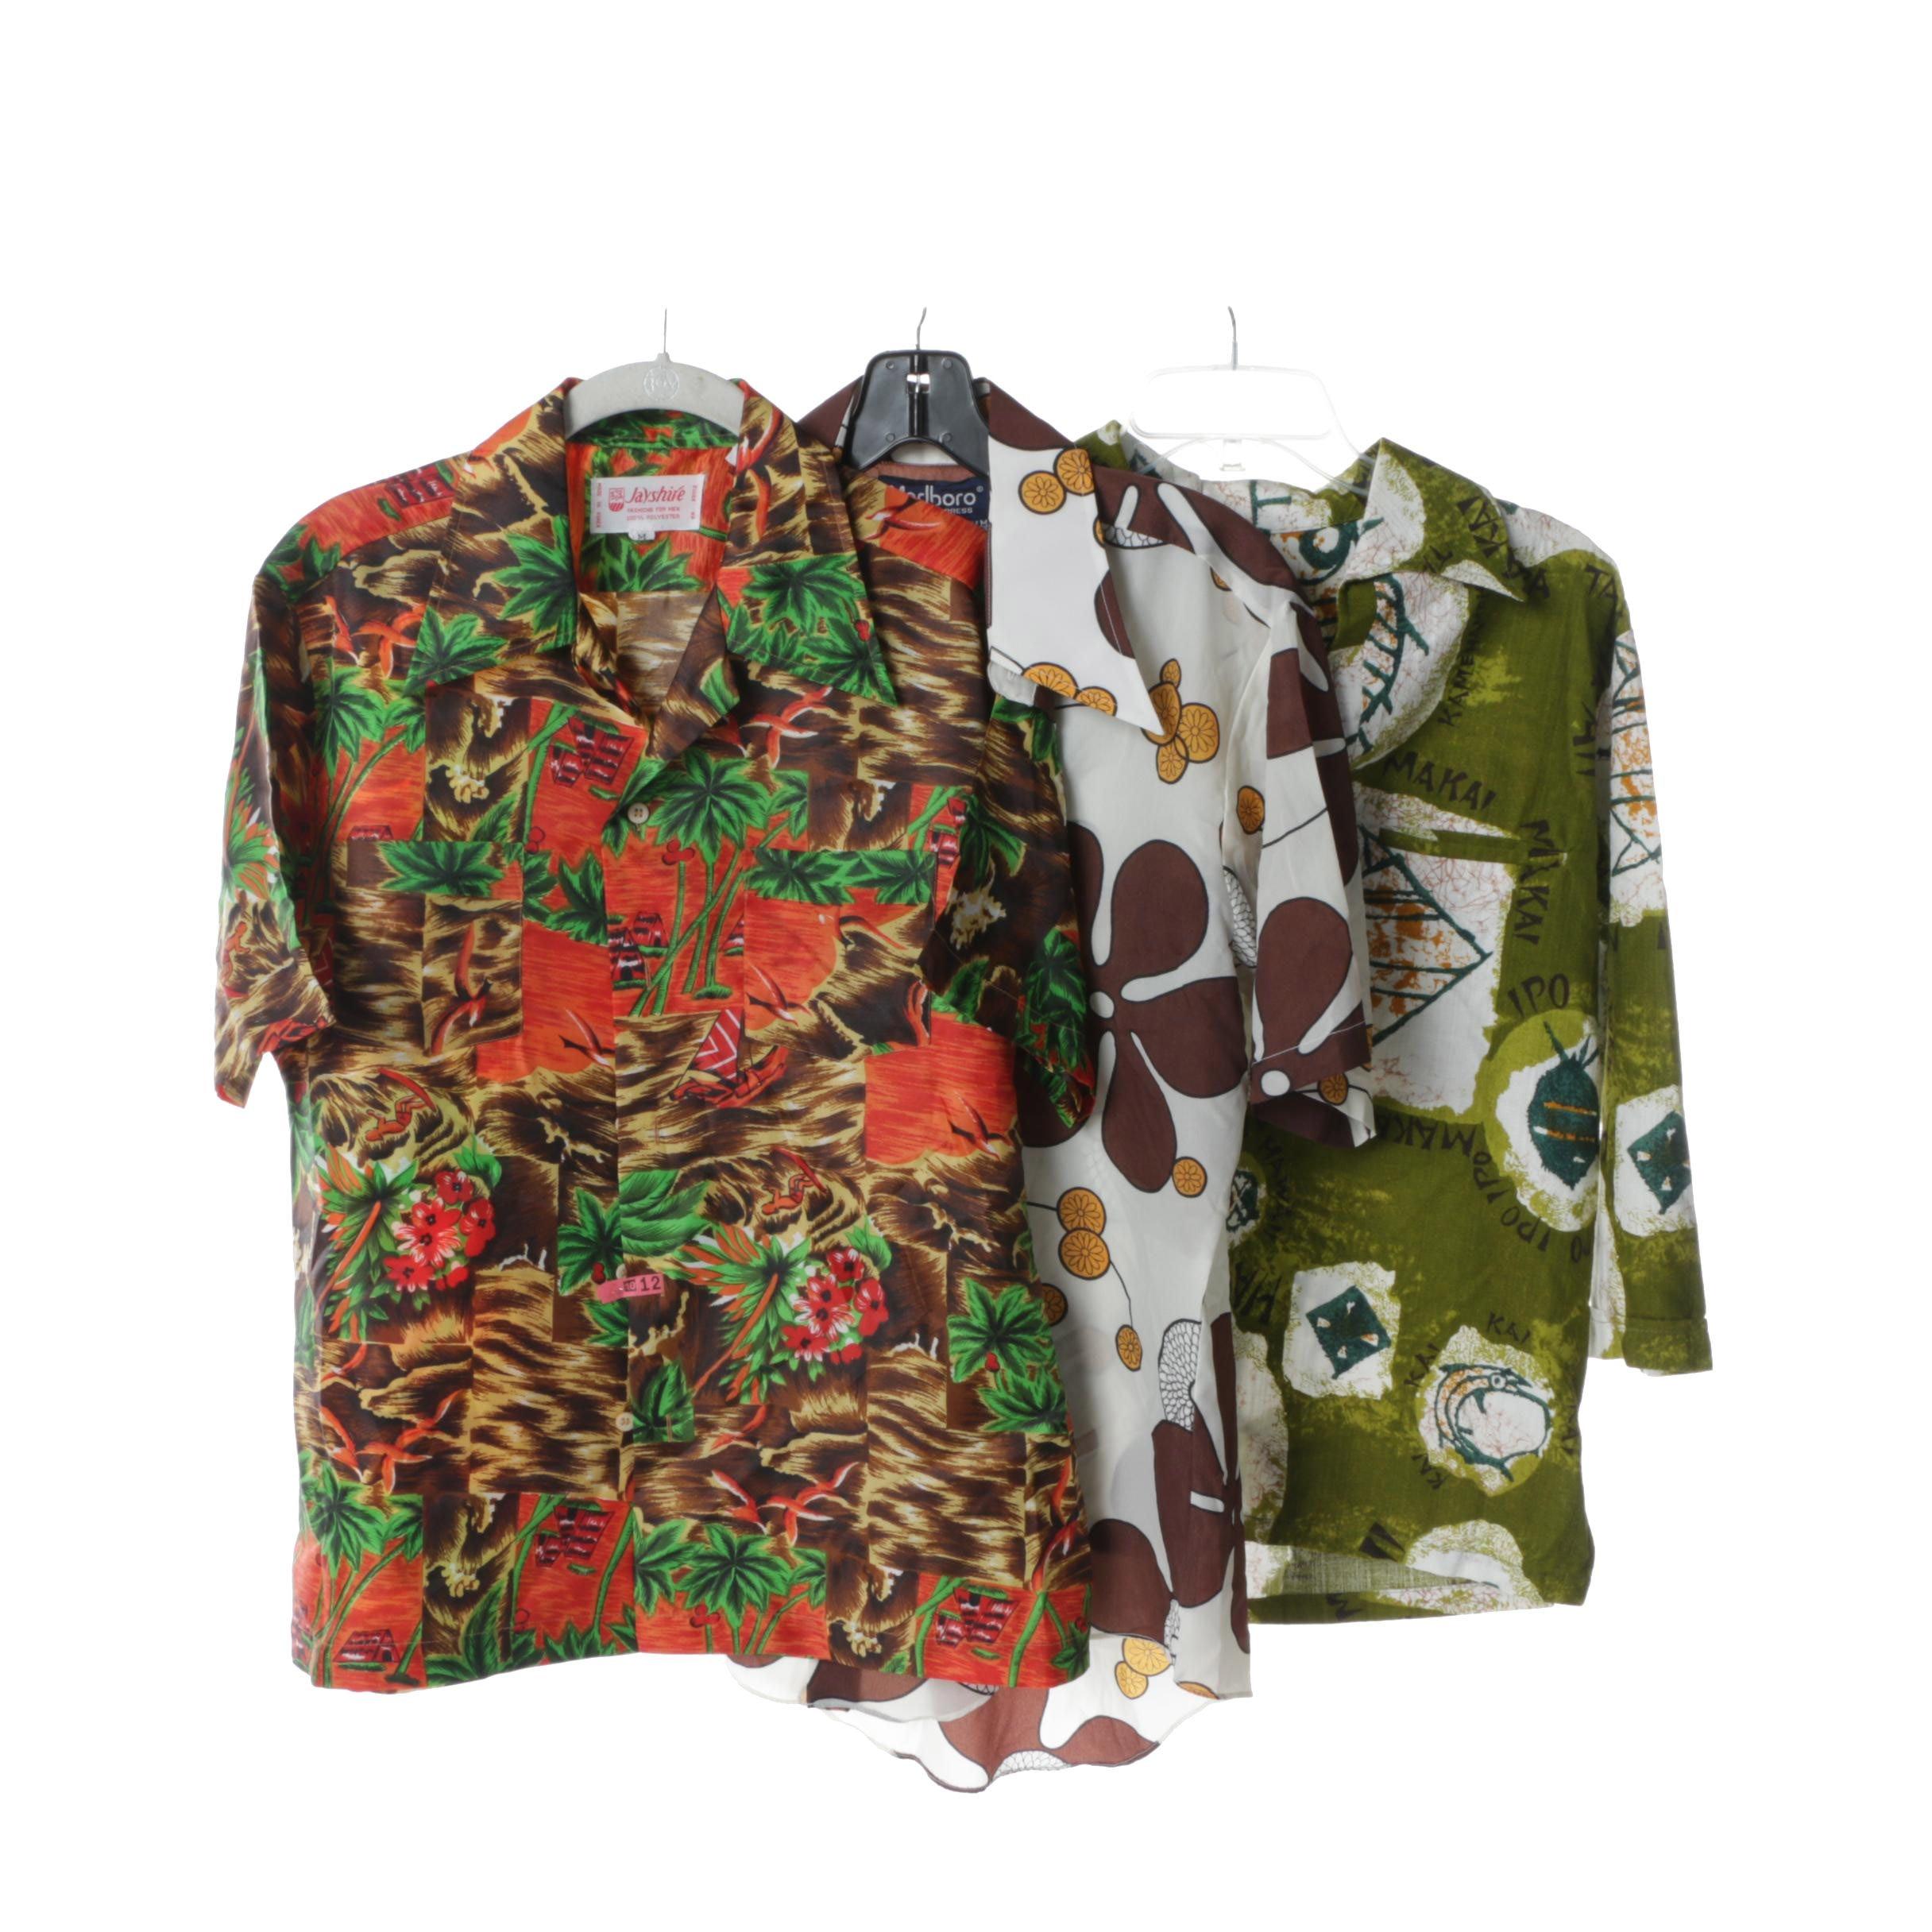 Men's Vintage Hawaiian Shirts Including Jayshire